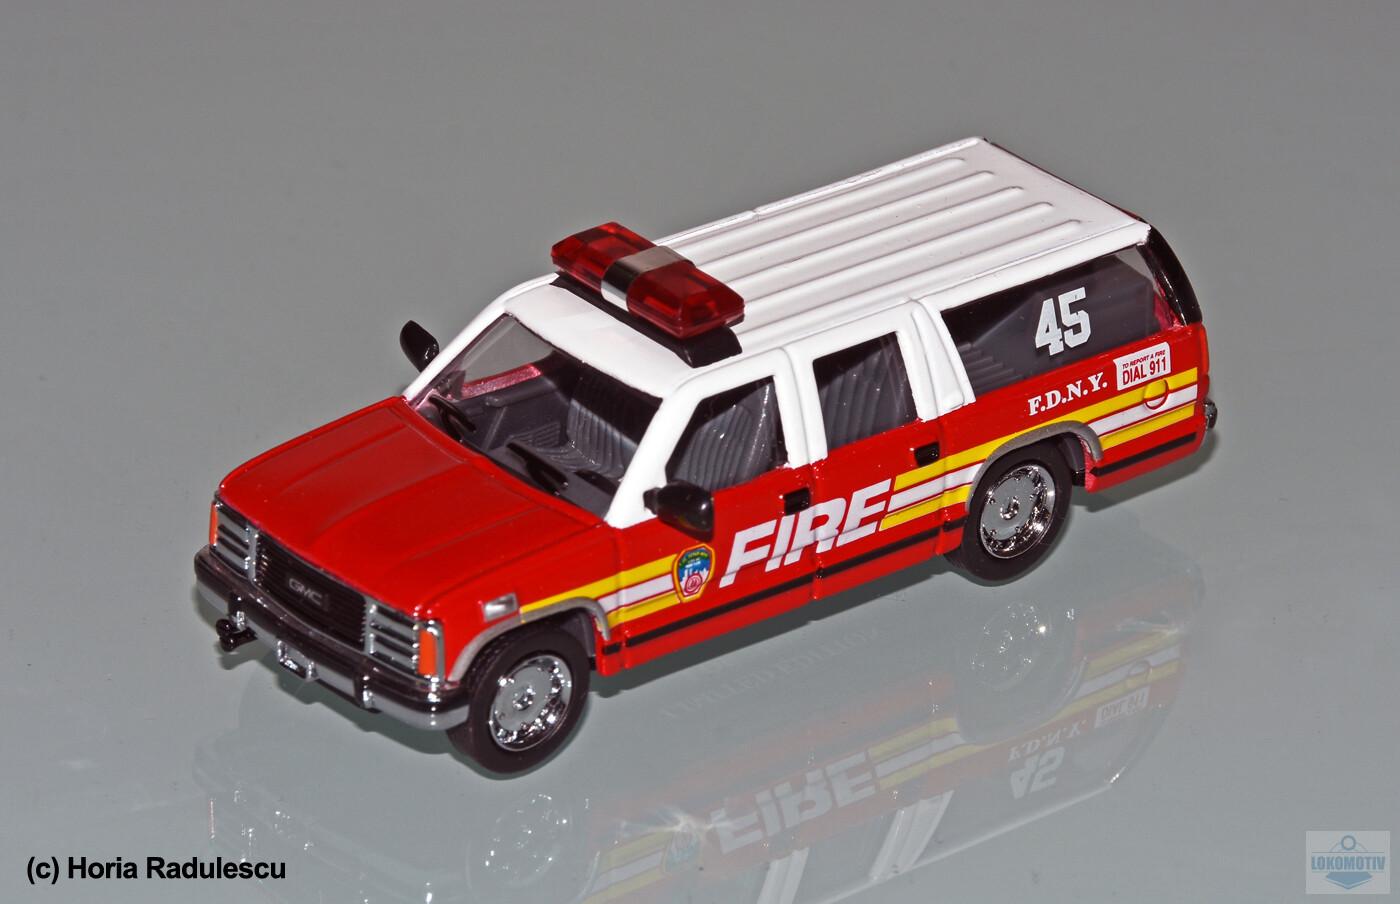 64-FDNY-GMC-Suburban-45-1d9594bf212139109.jpg